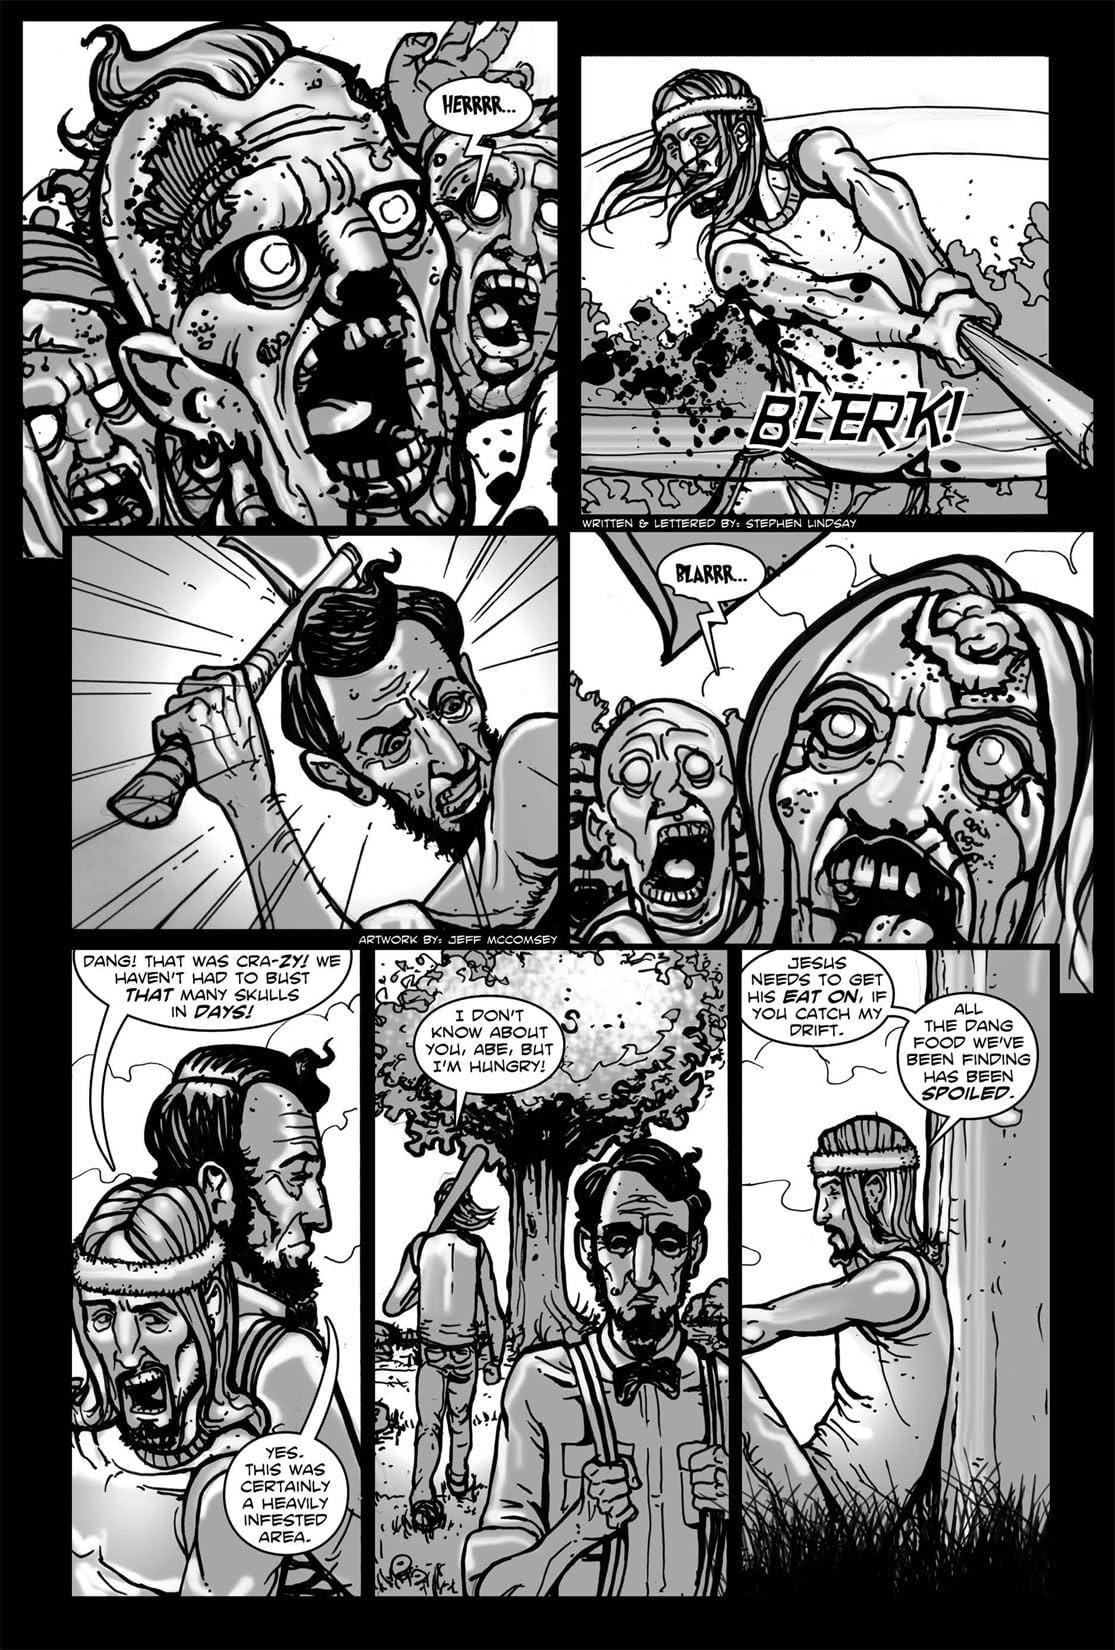 FCBD 2009 Attack of the Alterna Zombies